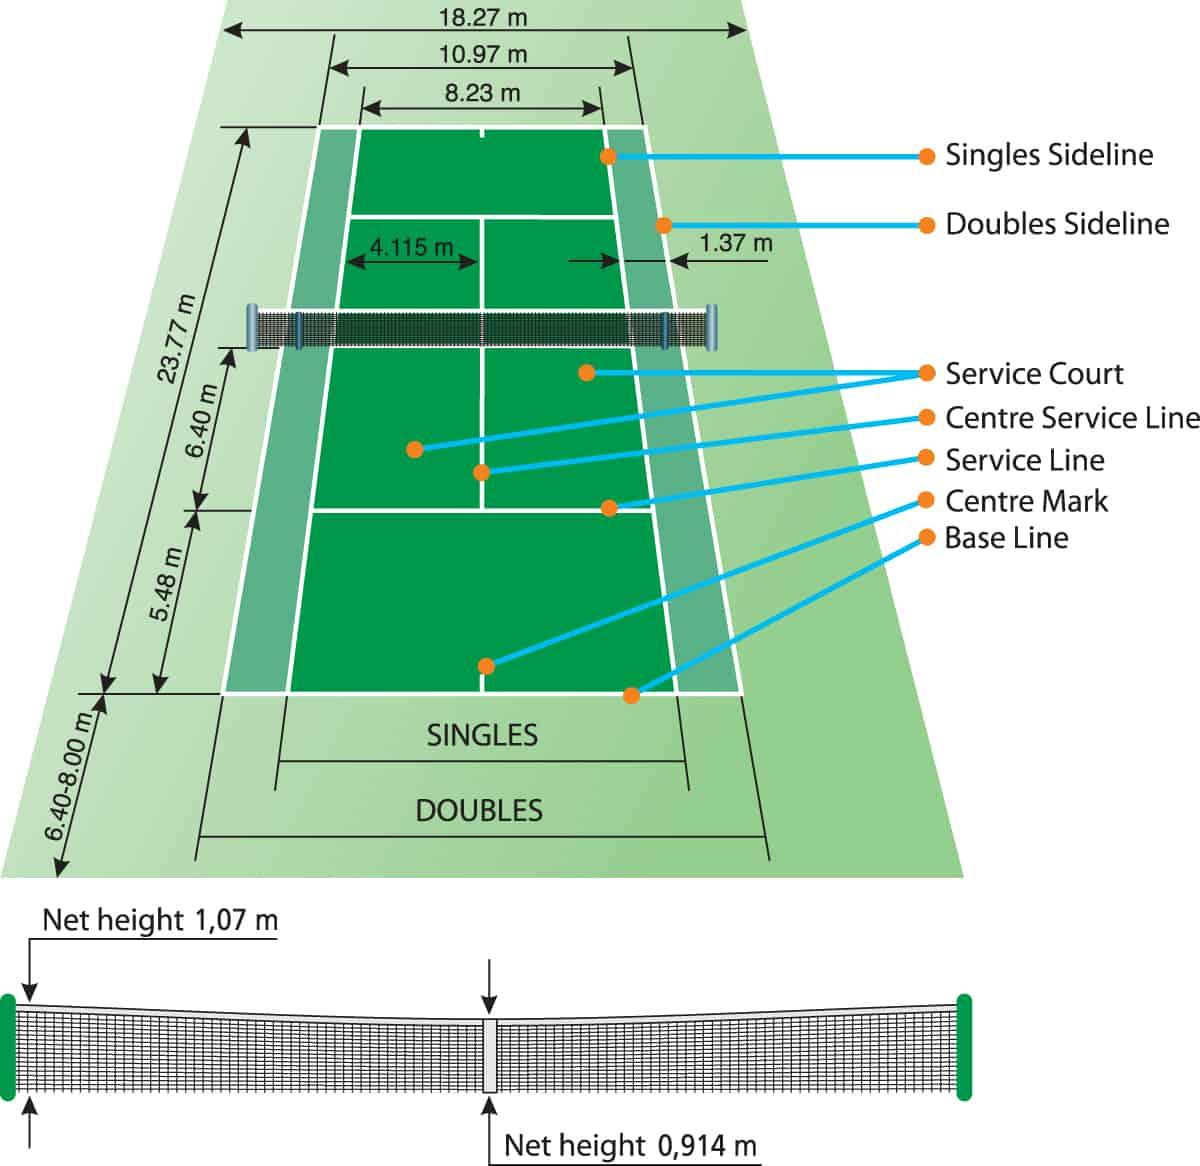 Dimensions of a Tennis Court Diagram